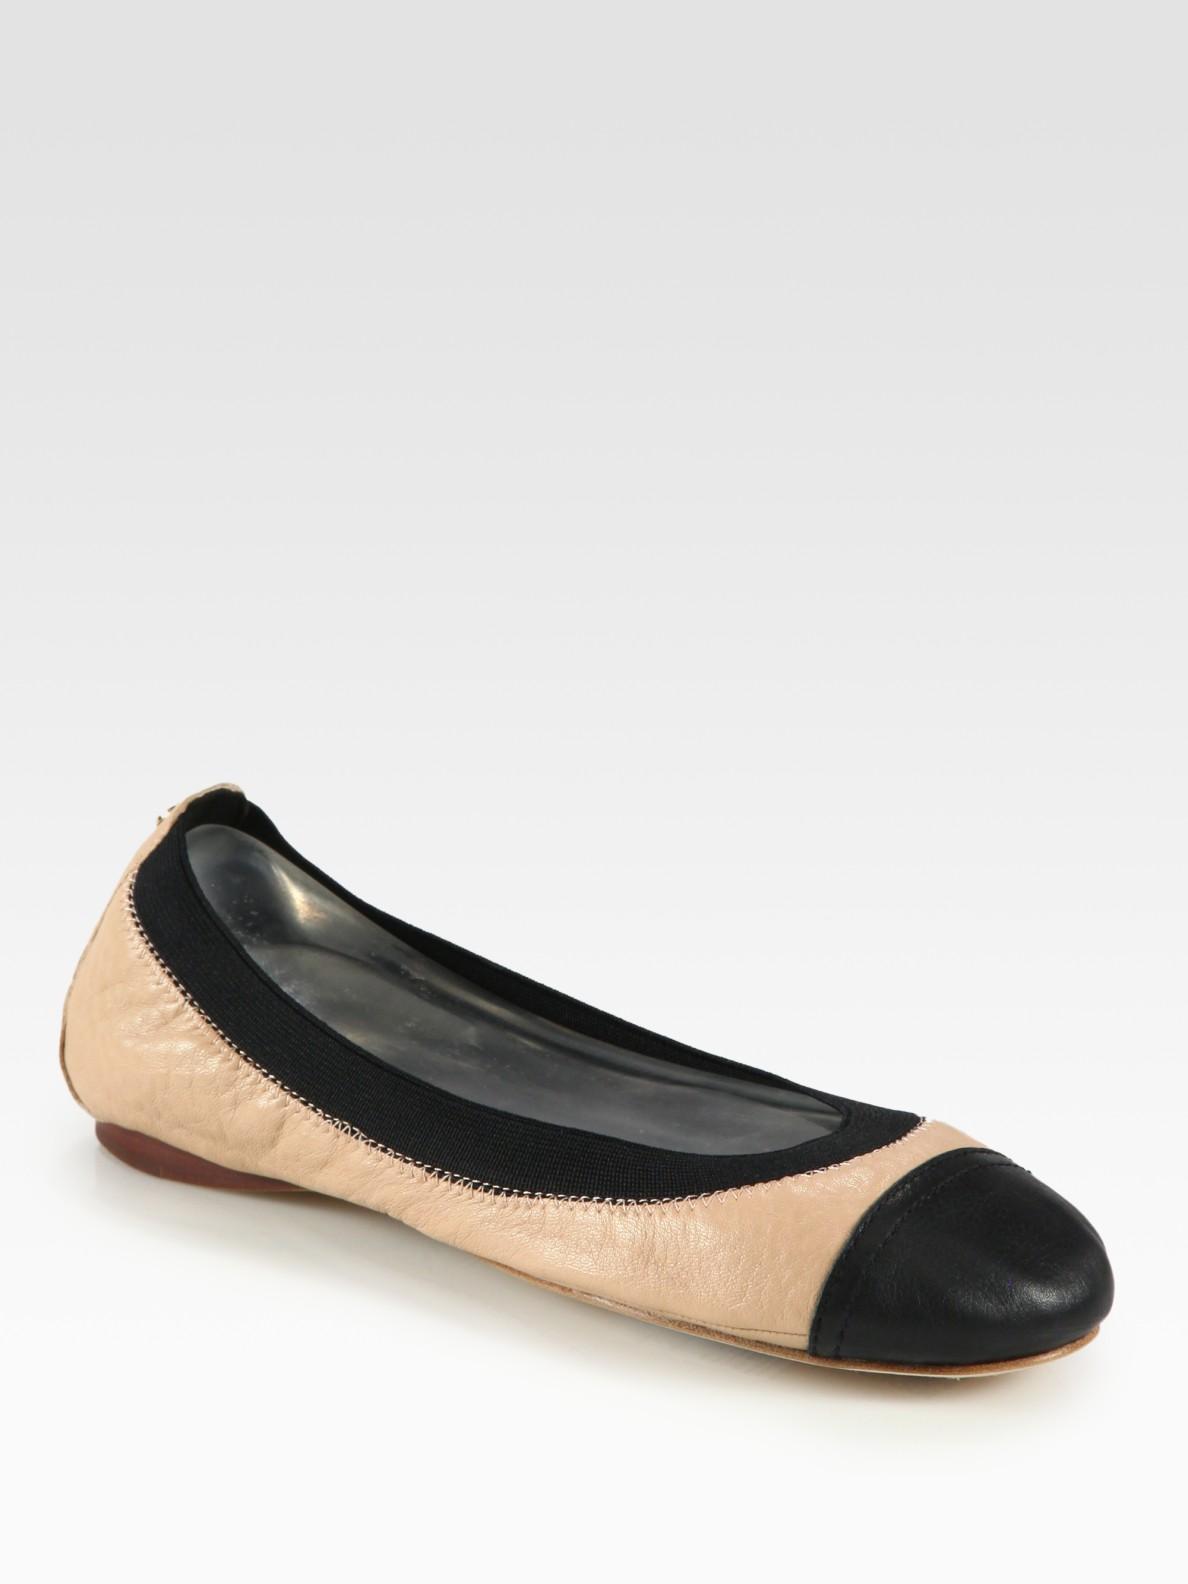 Saks Tory Burch Shoes Sale